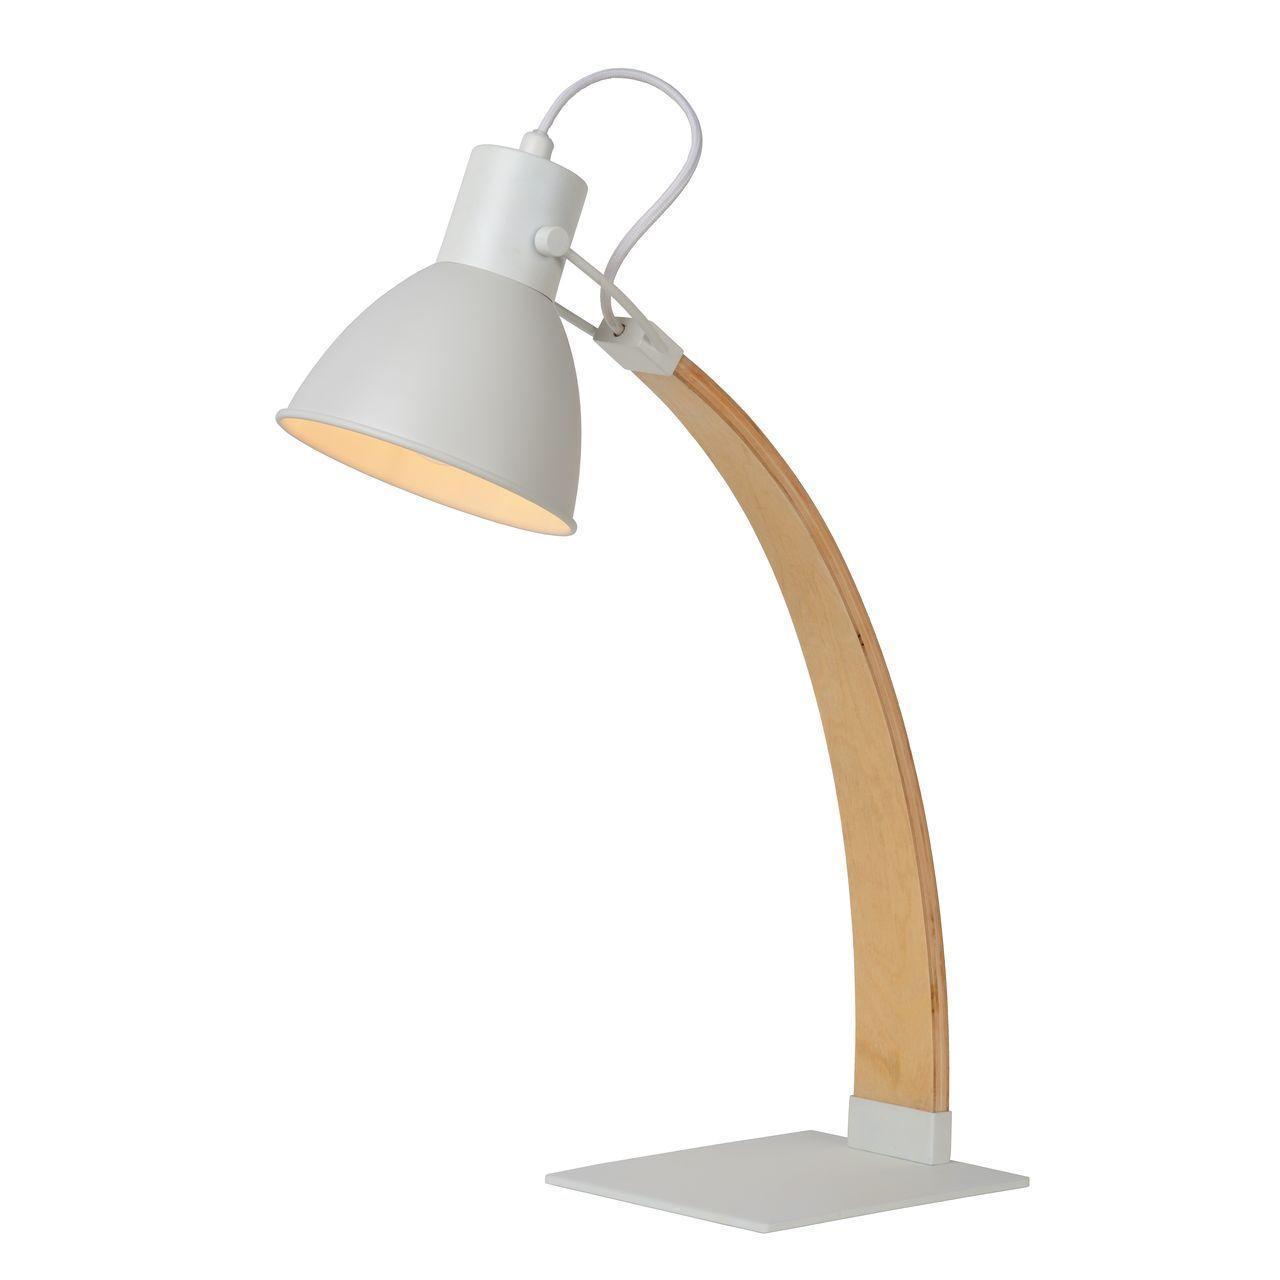 Настольная лампа Lucide Curf 03613/01/31 торшер lucide curf 03713 01 30